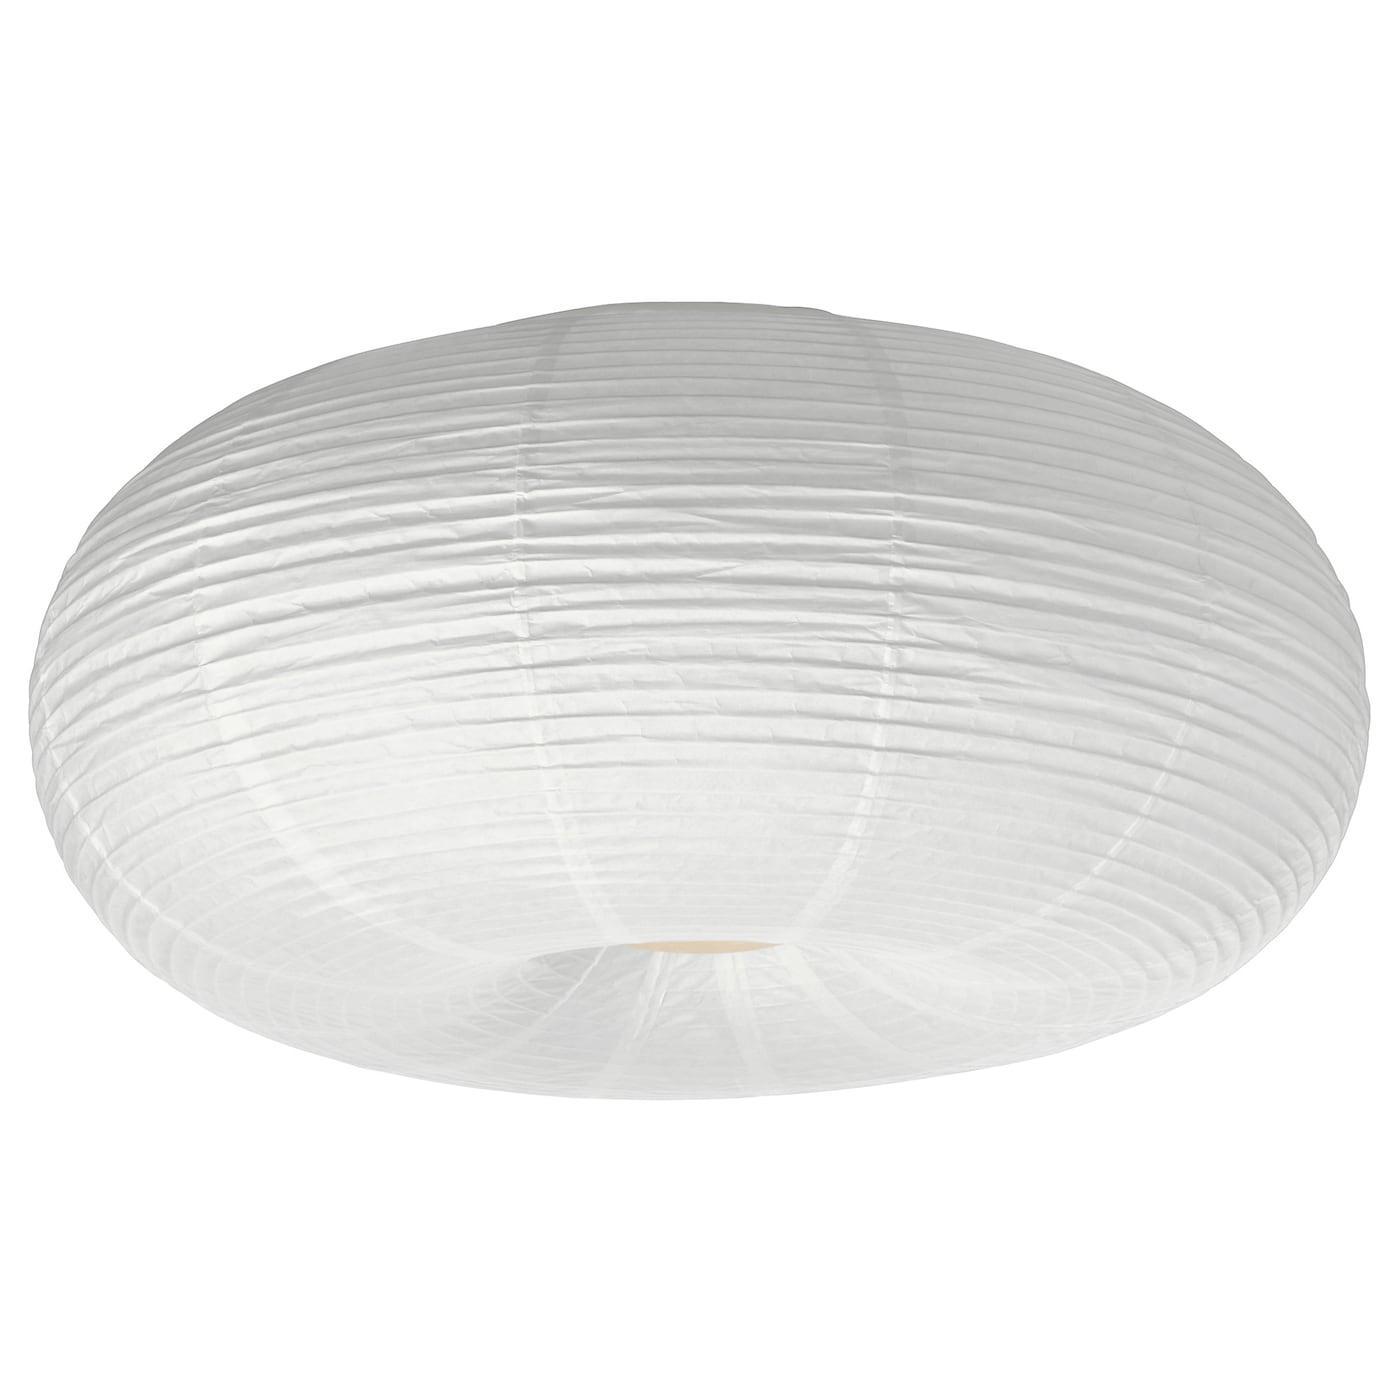 Ikea Deckenlampe Led